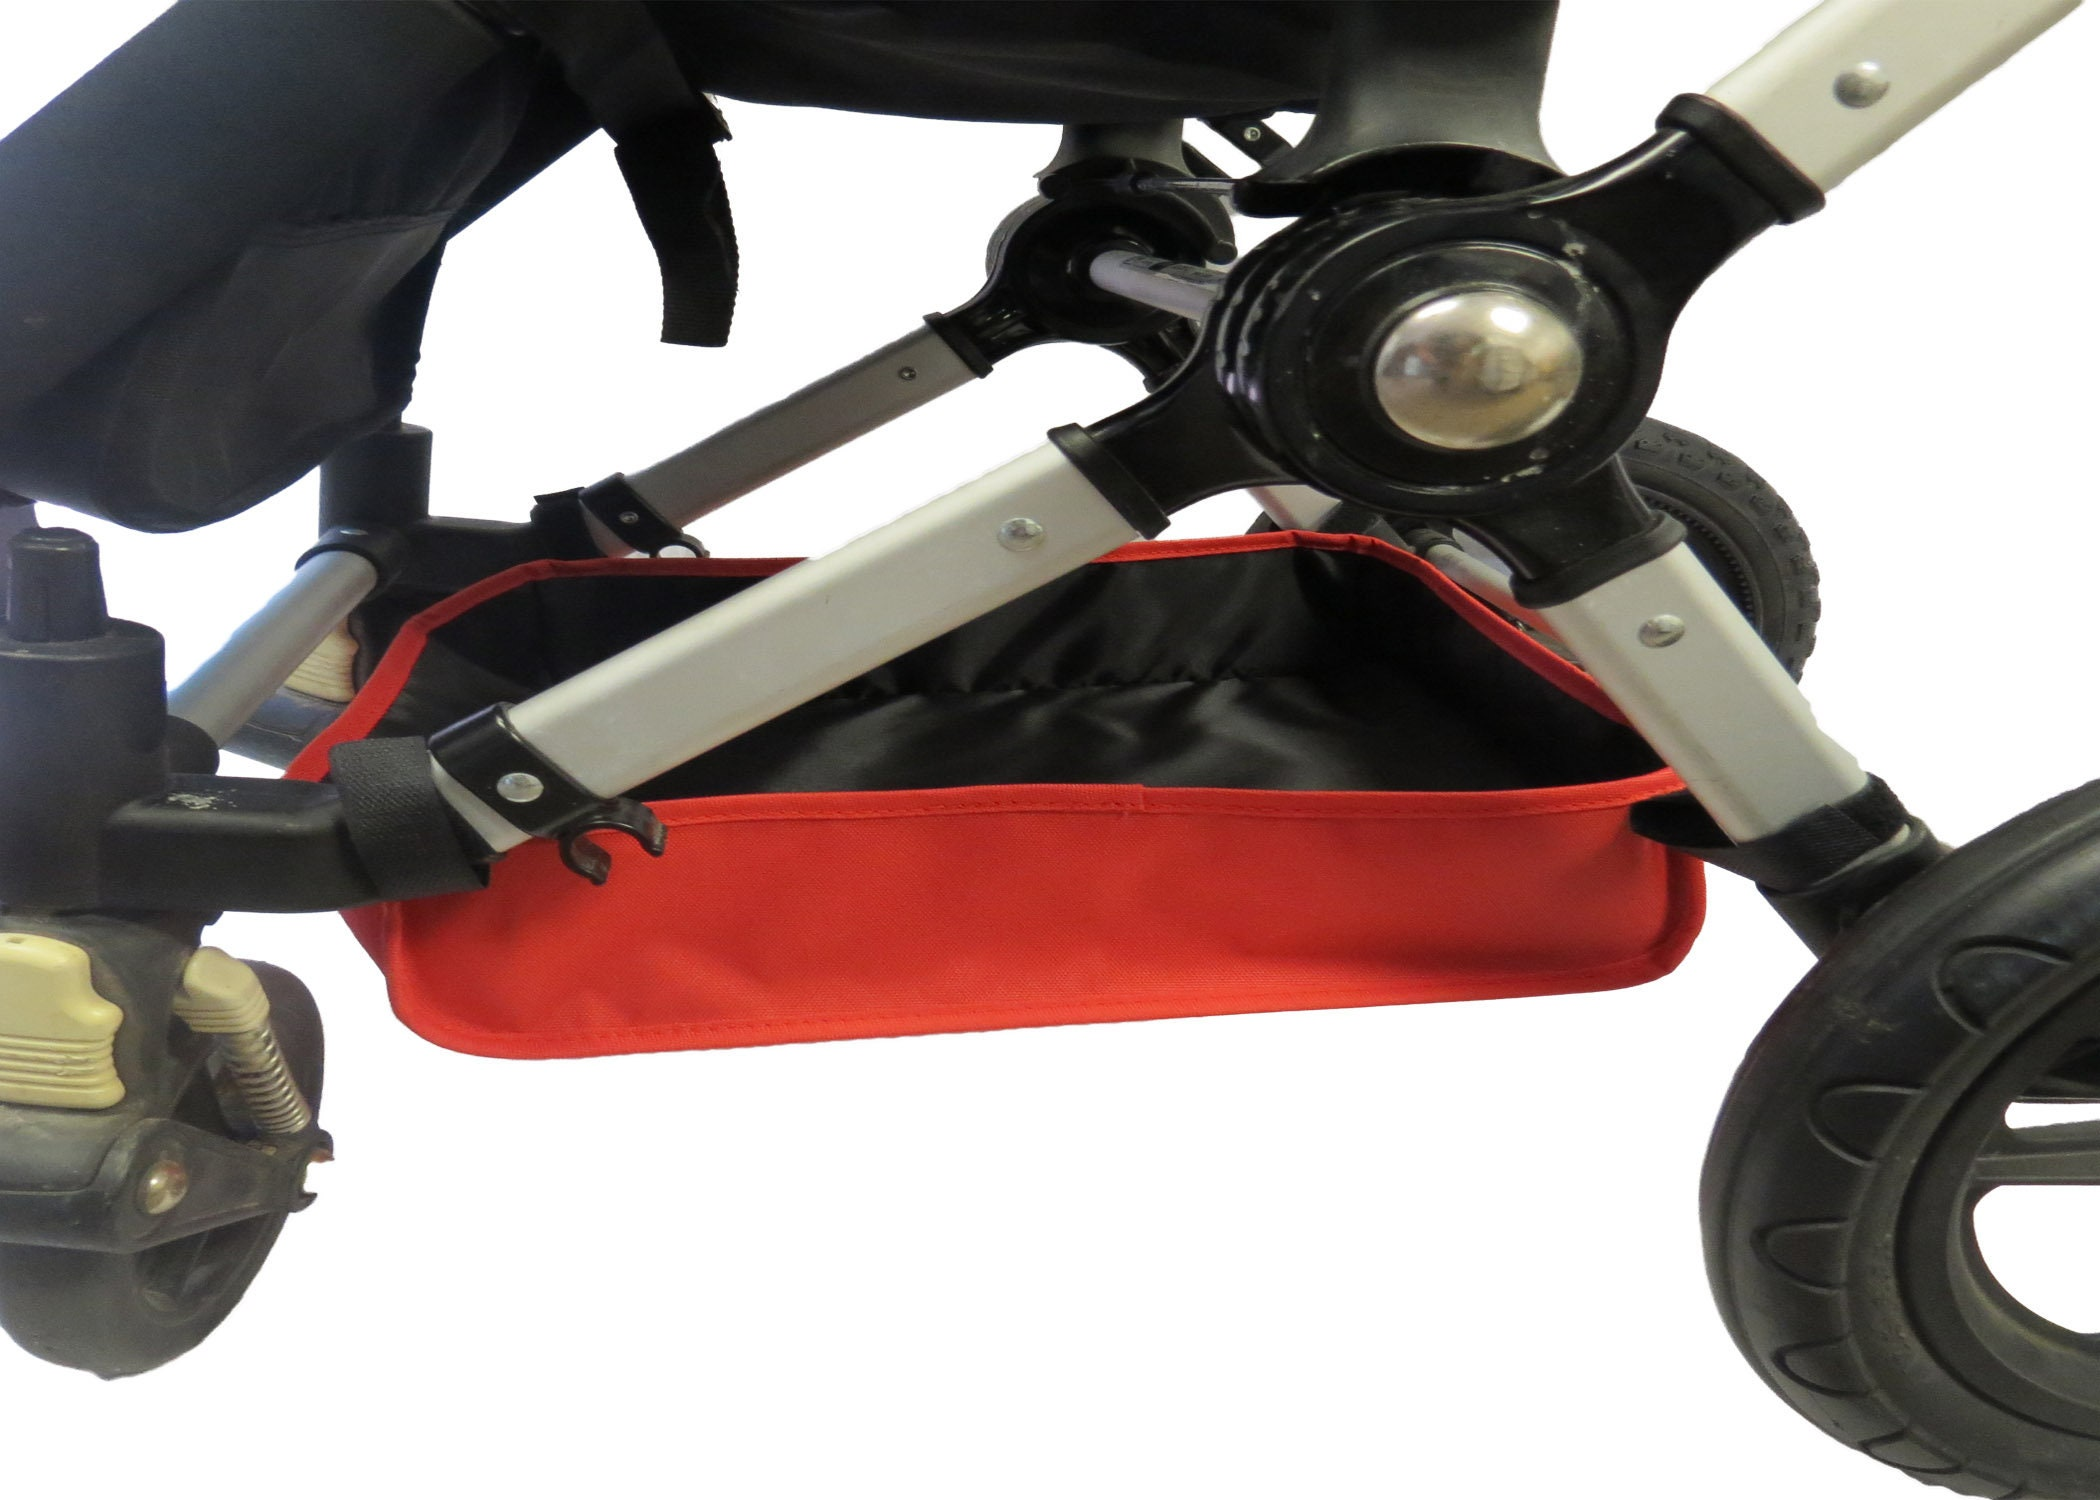 Bugaboo Cameleon 1,2,3 Baby Stroller Underseat Storage Bag Basket Gray Grey Frog